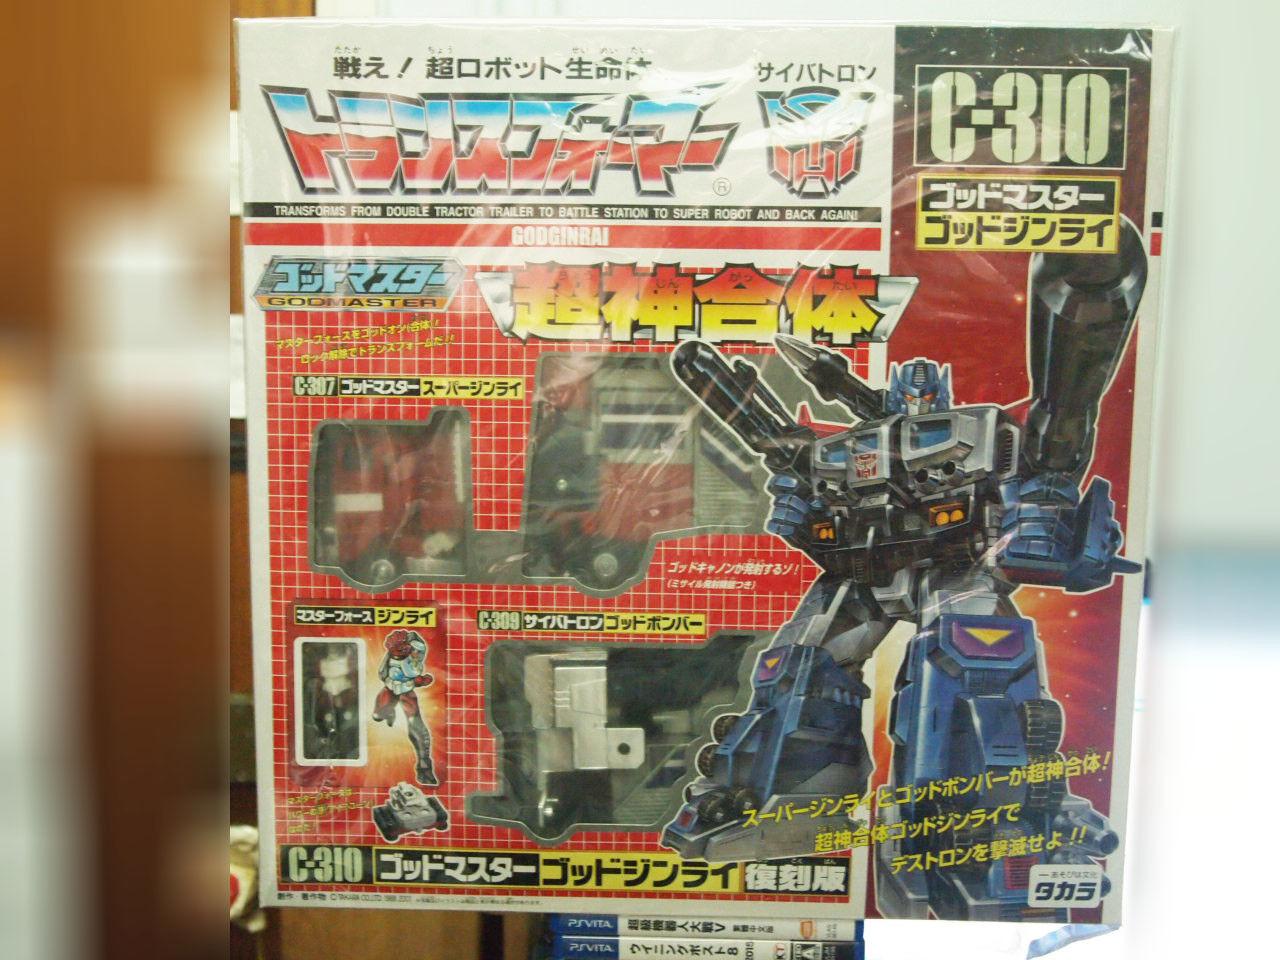 Takara transformers Powermaster CONVOY GODGINRAI C -310 Godmästjärnae Optimus Reissue